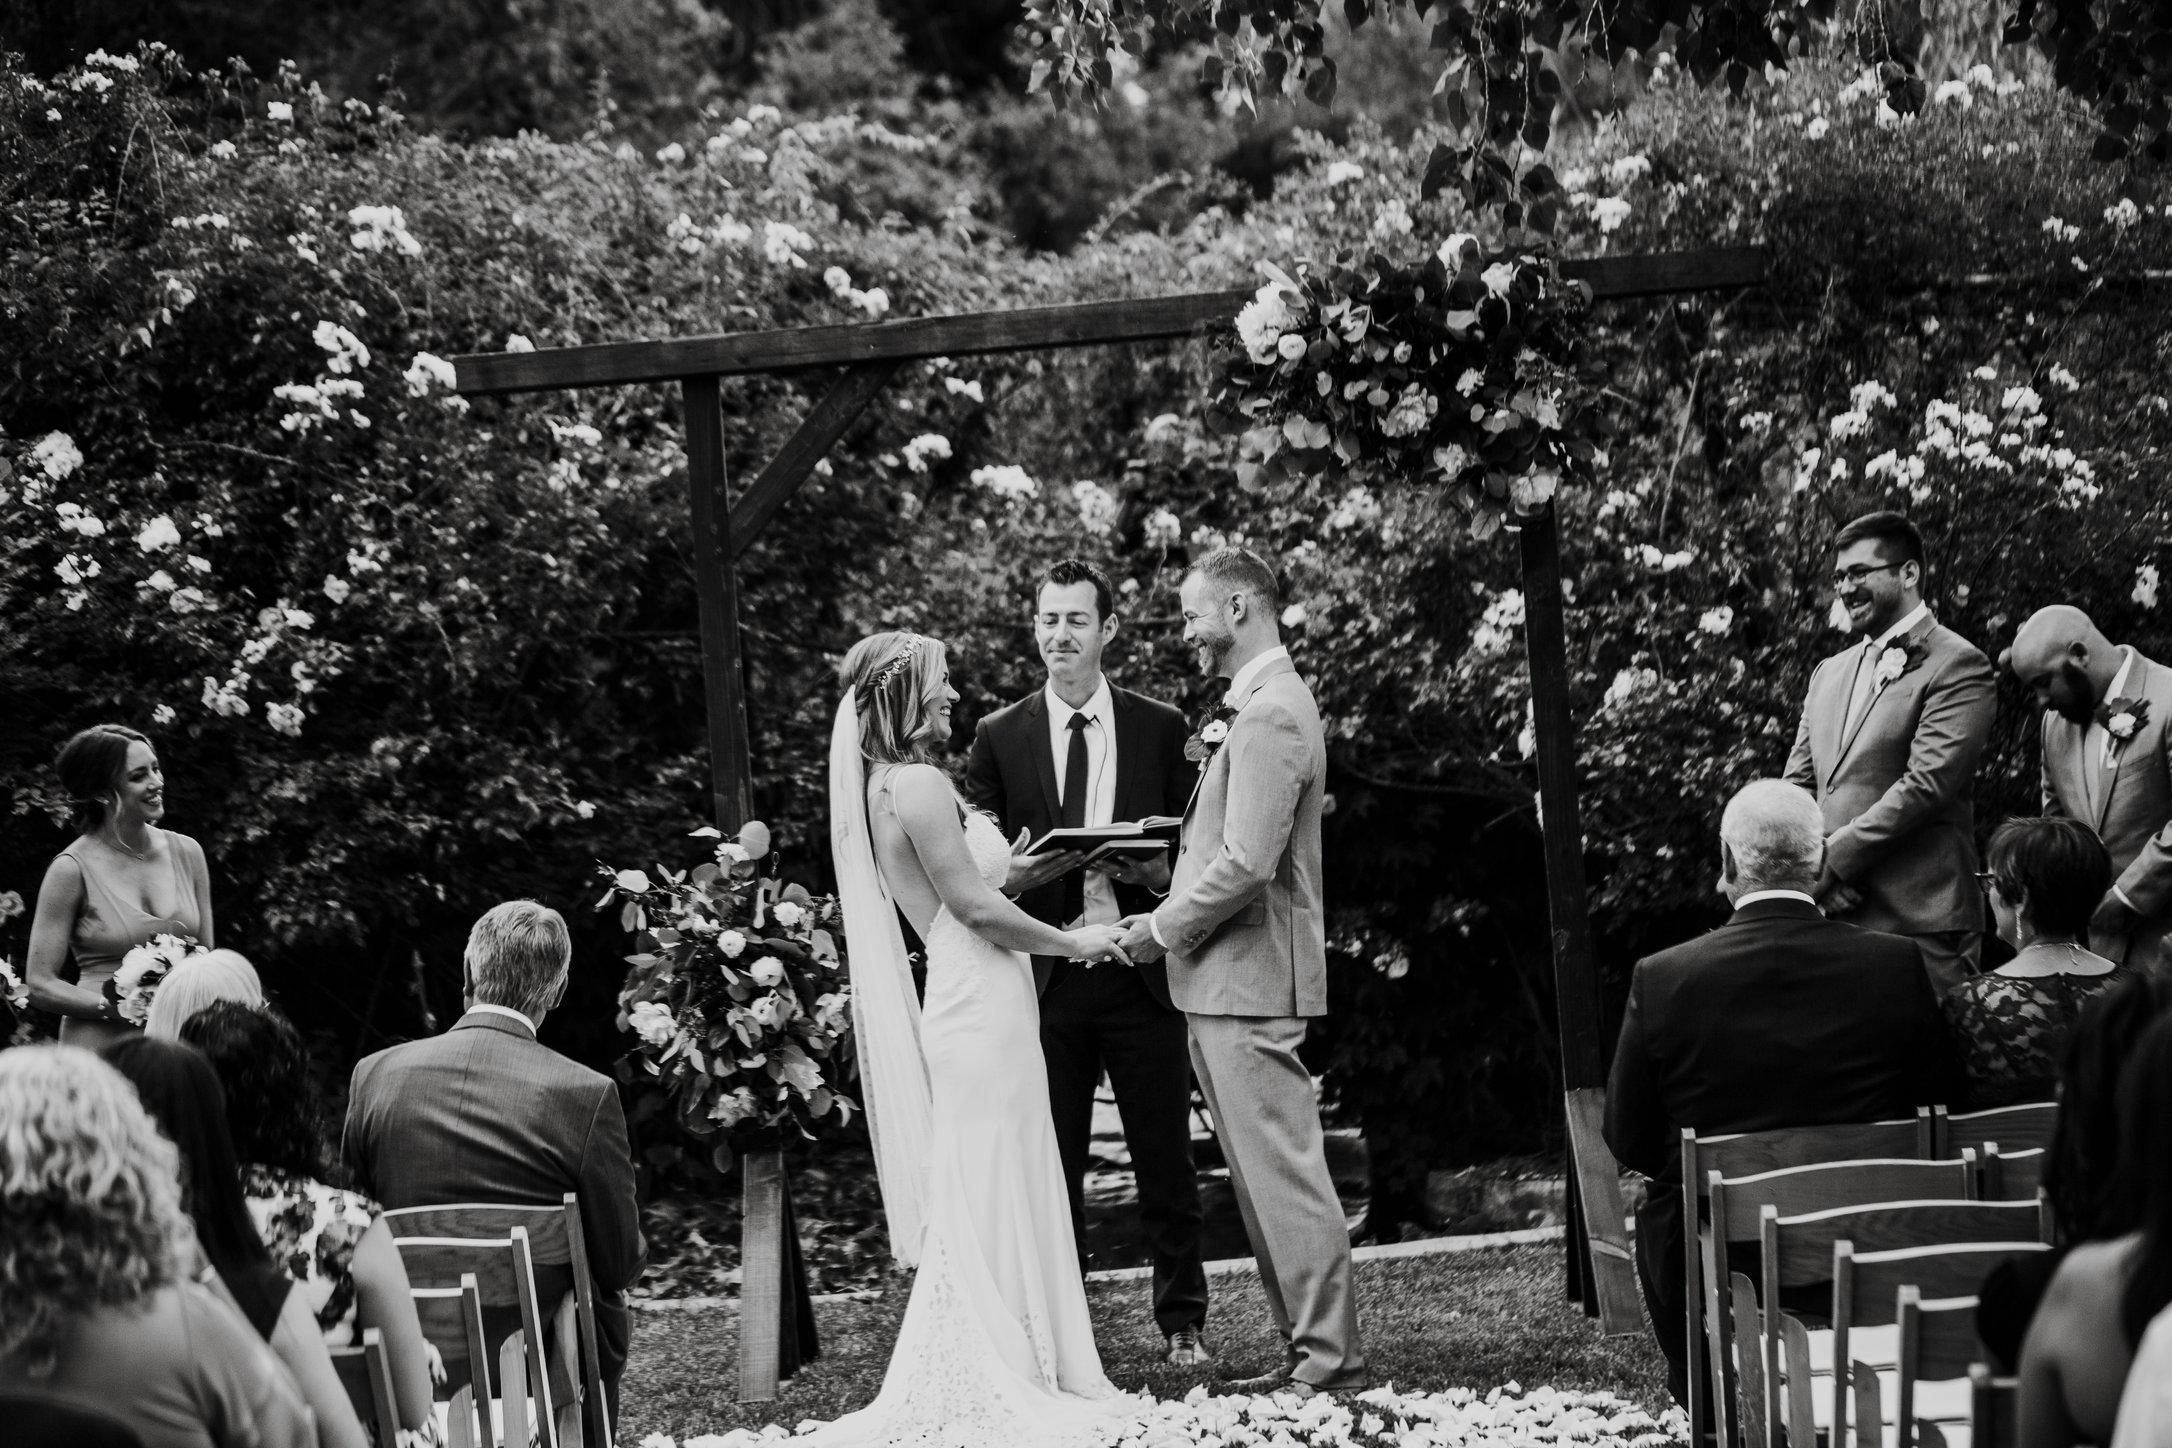 DandA-wedding-254.jpg